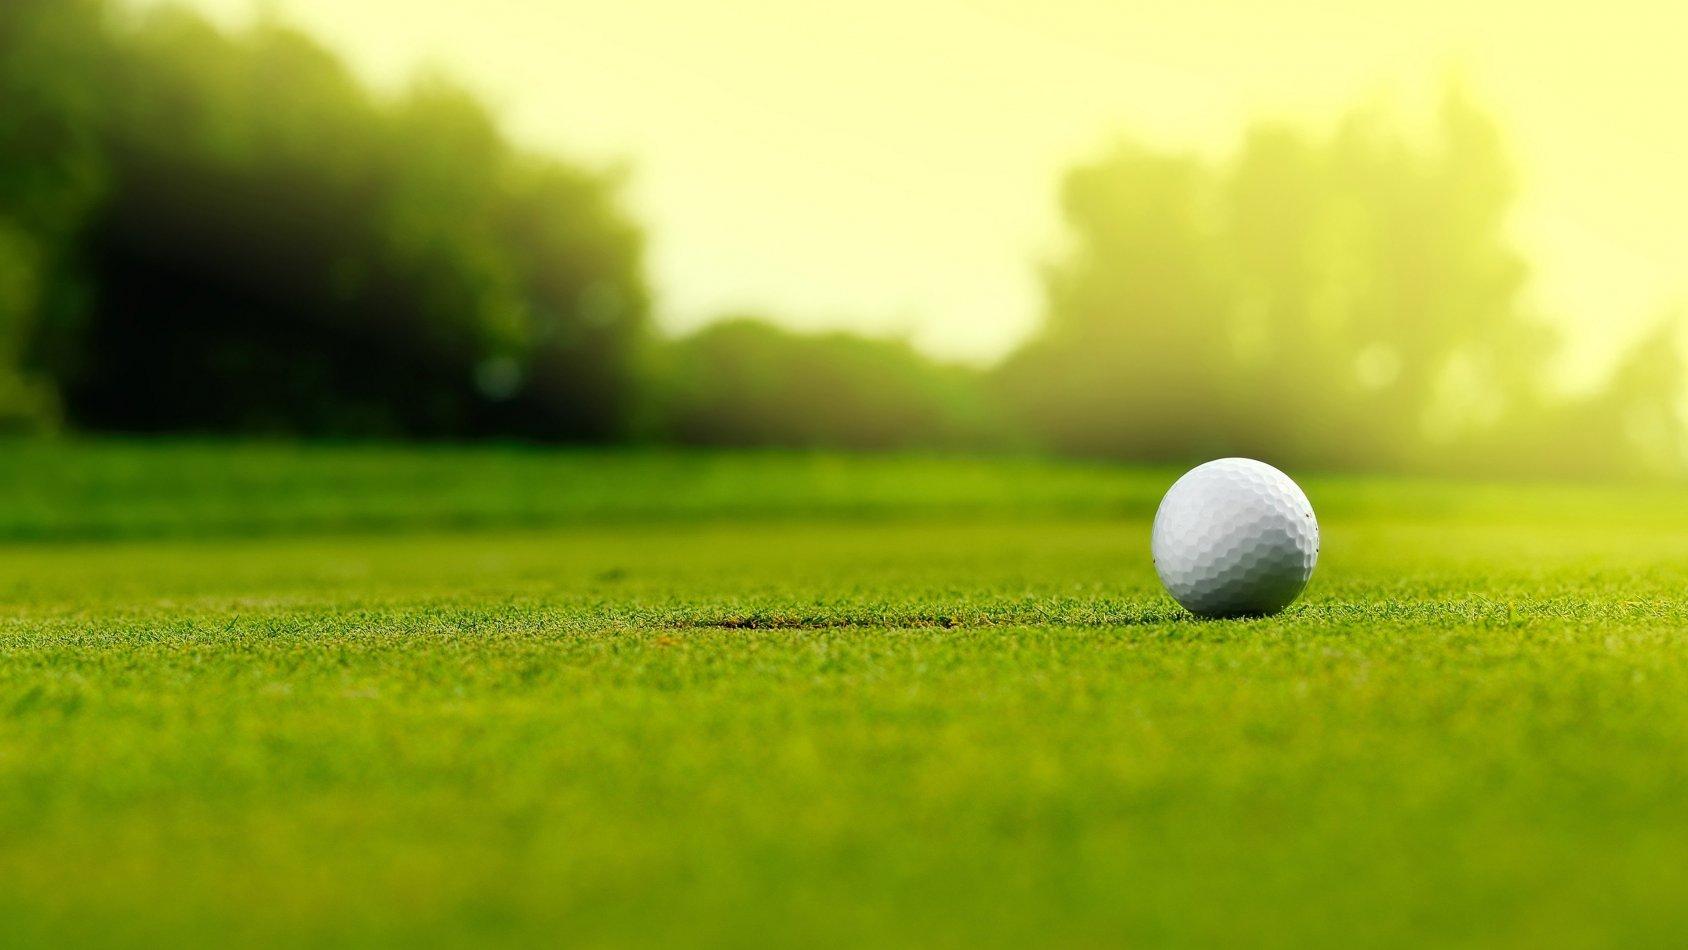 The PGA Tour Champions Highlights